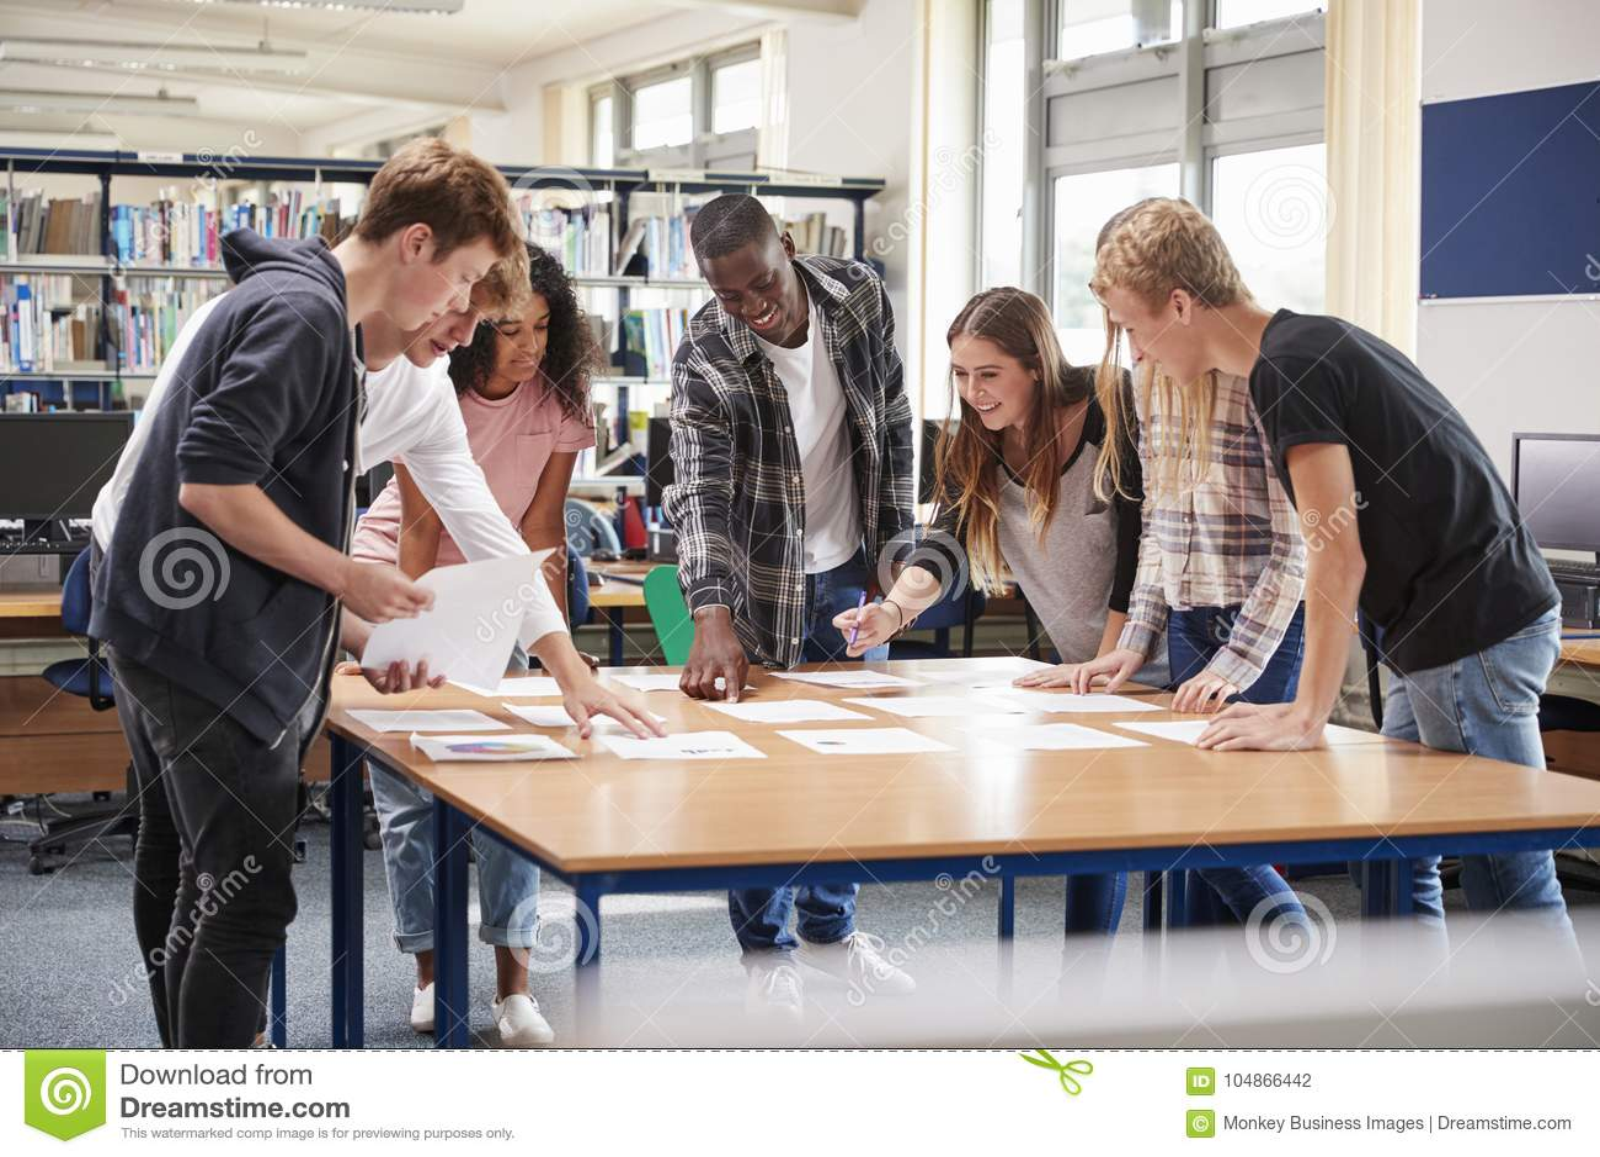 Grupa studenci collegu Kolaboruje Na projekcie W bibliotece